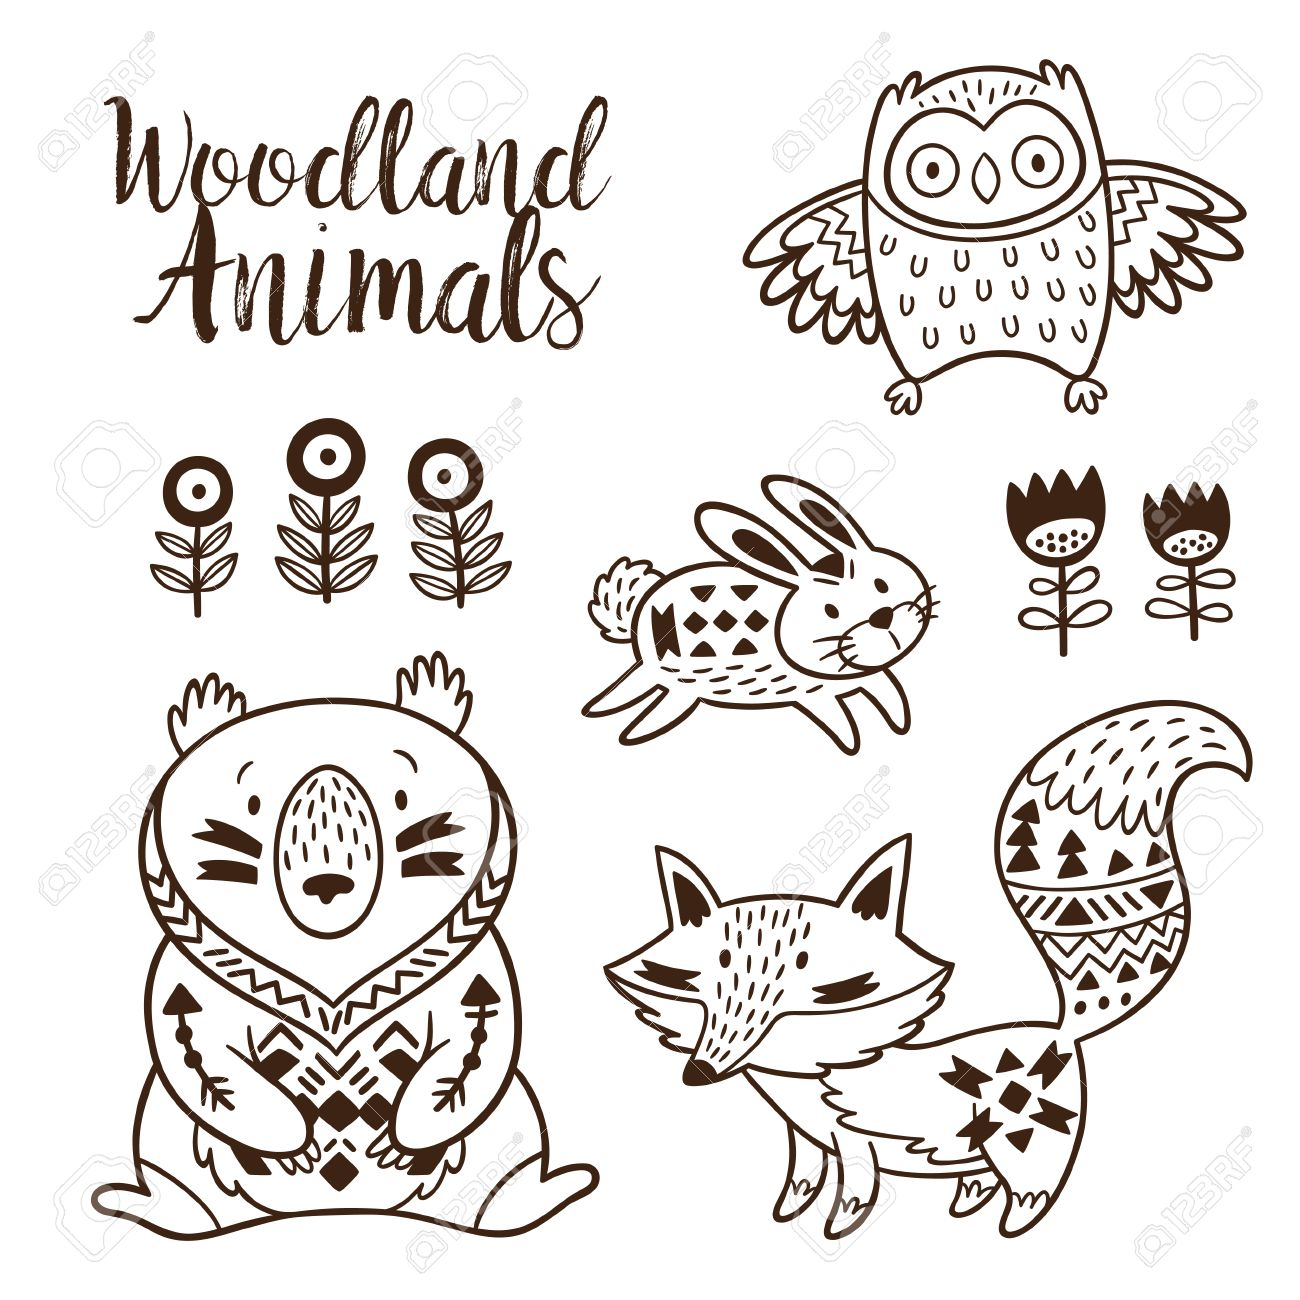 Único Dibujos De Bosques Para Colorear E Imprimir